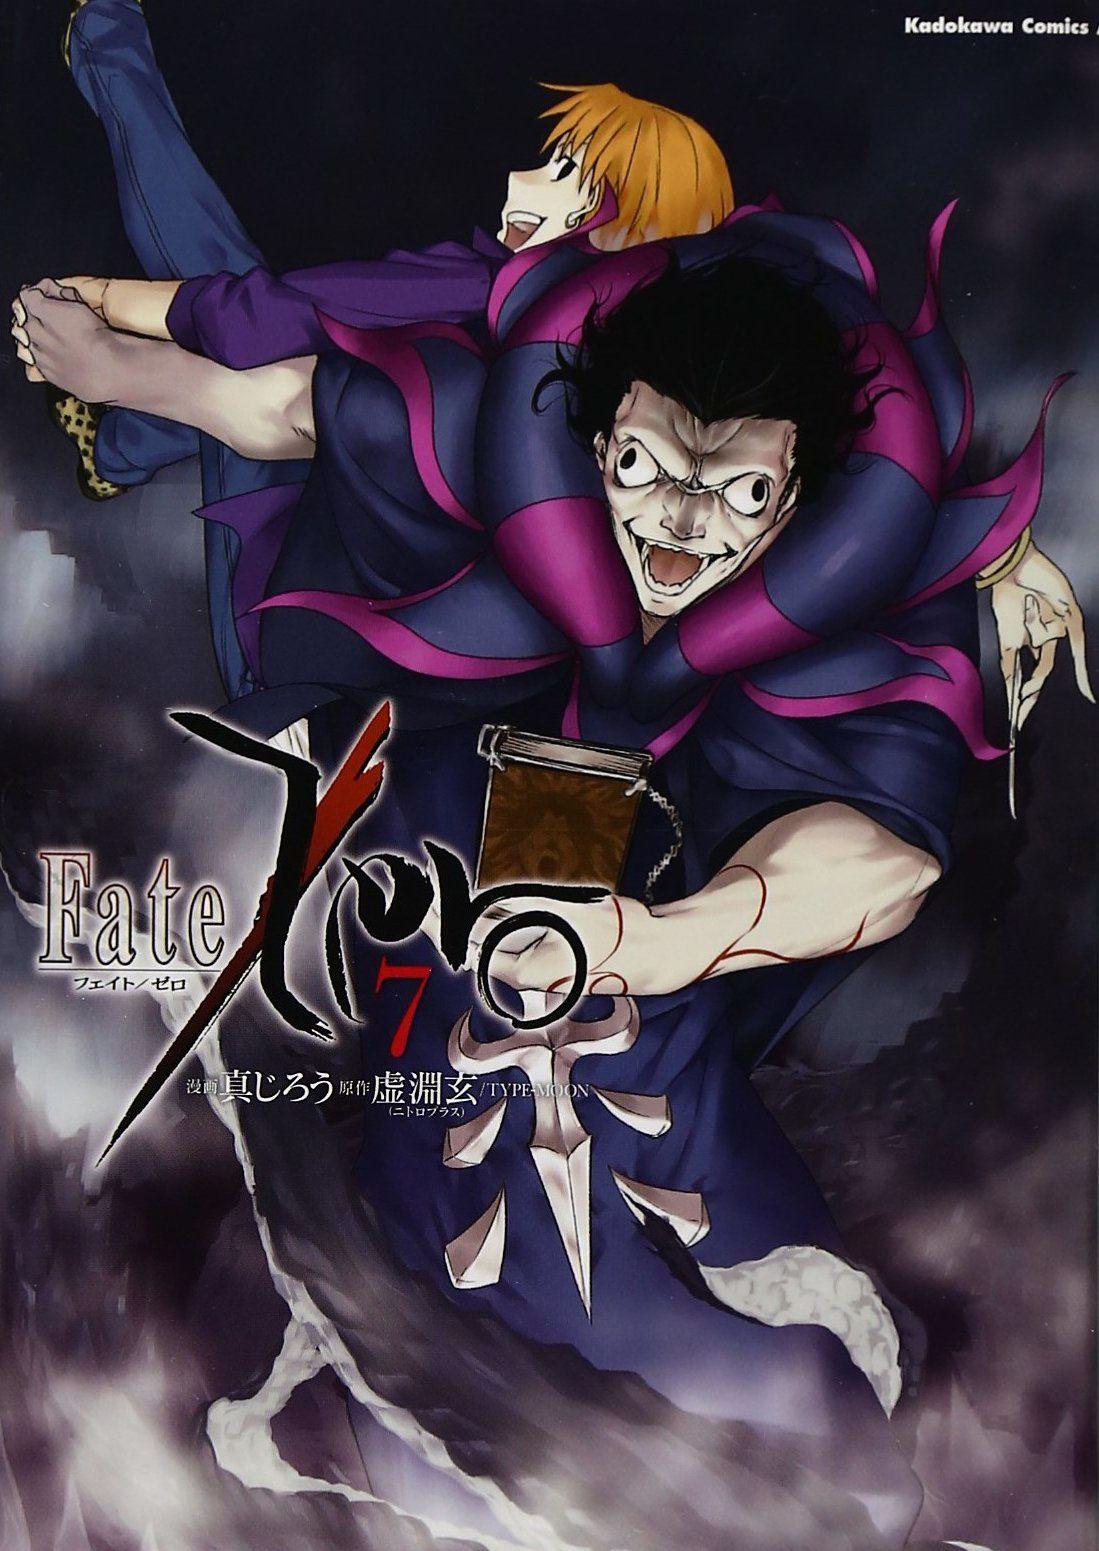 「Anime Fate/Zero 2011.10.02」おしゃれまとめの人気アイデア|Pinterest